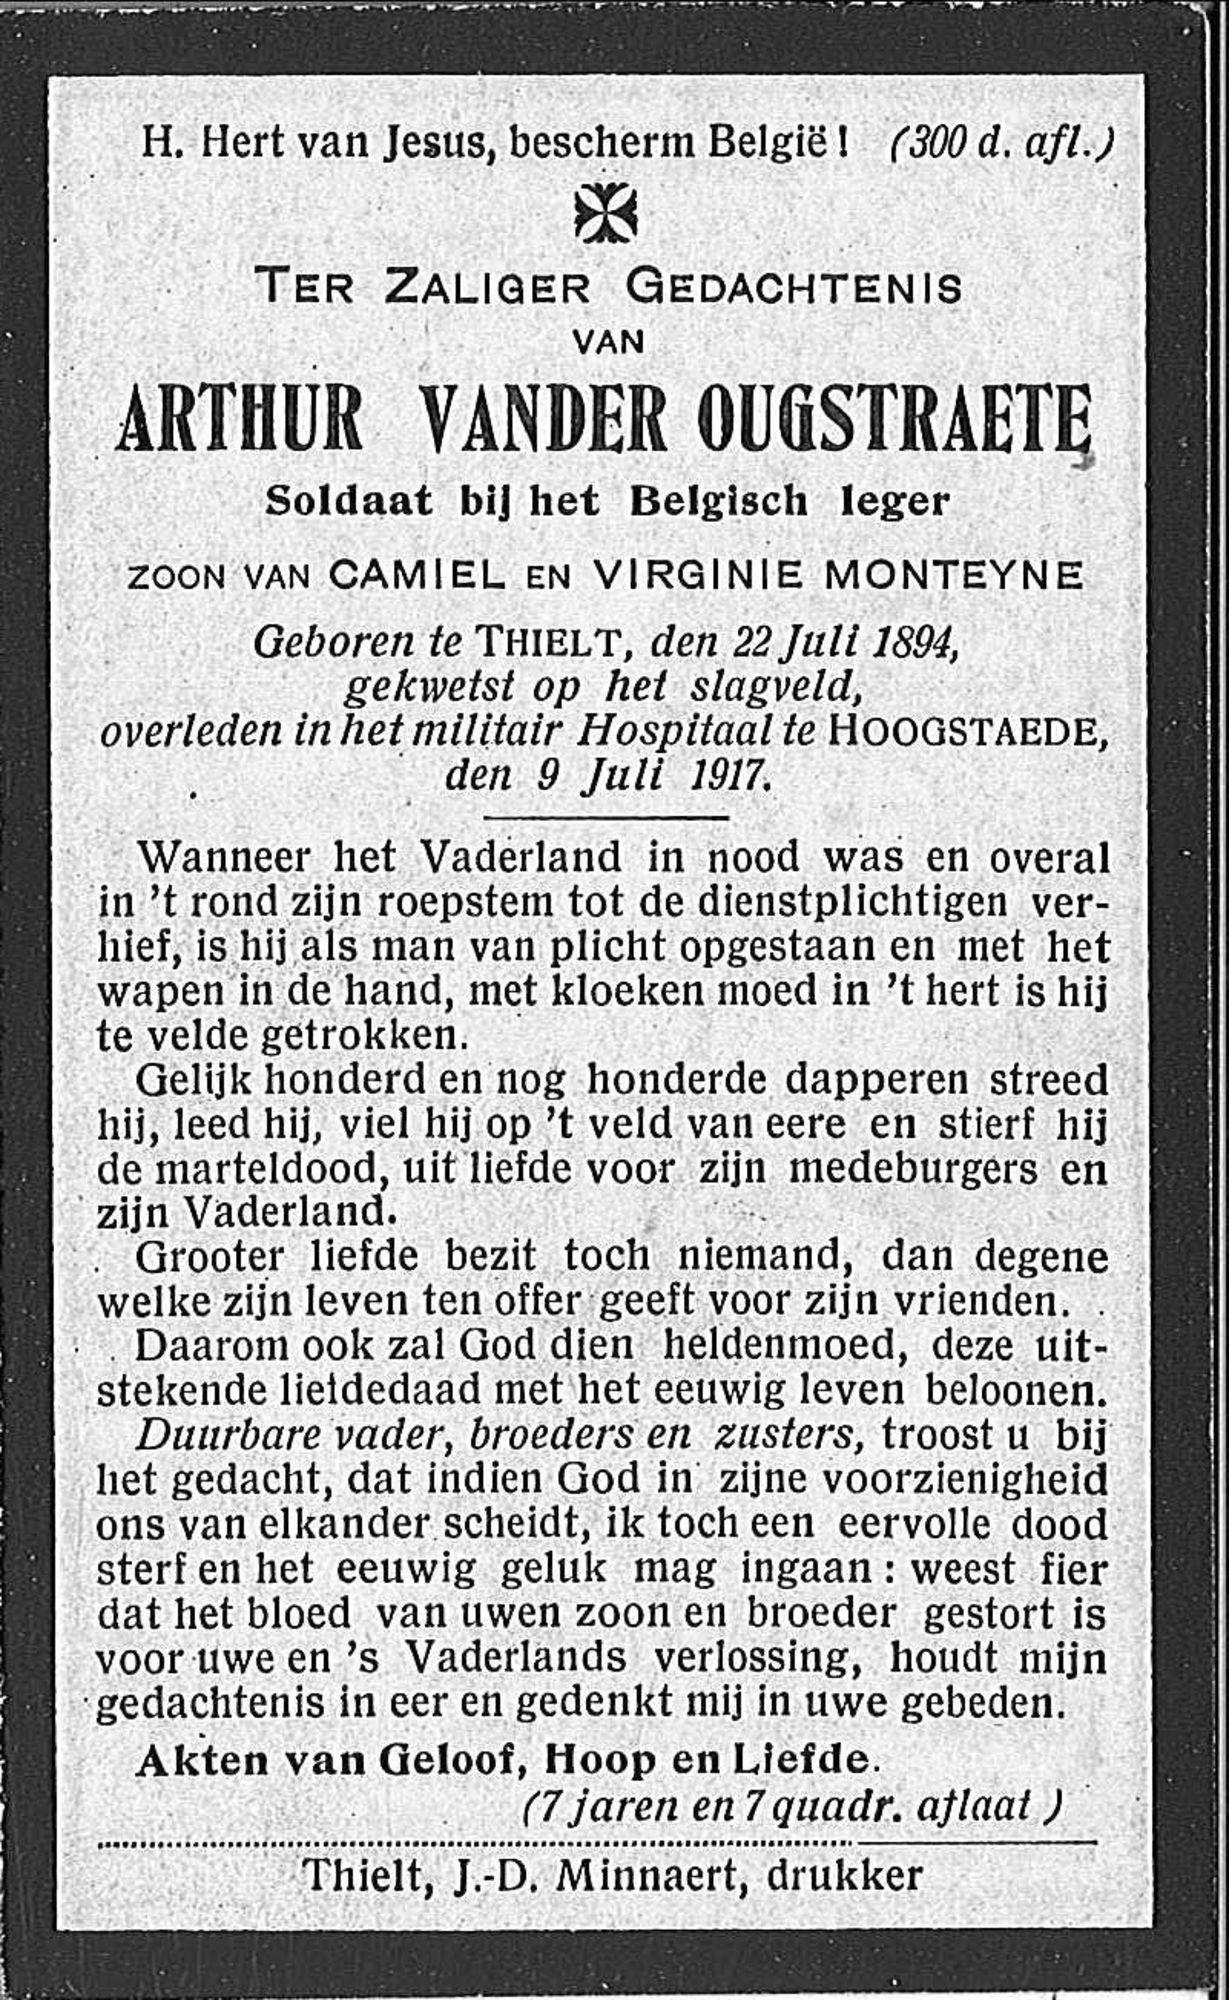 Arthur Vander Ougstraete